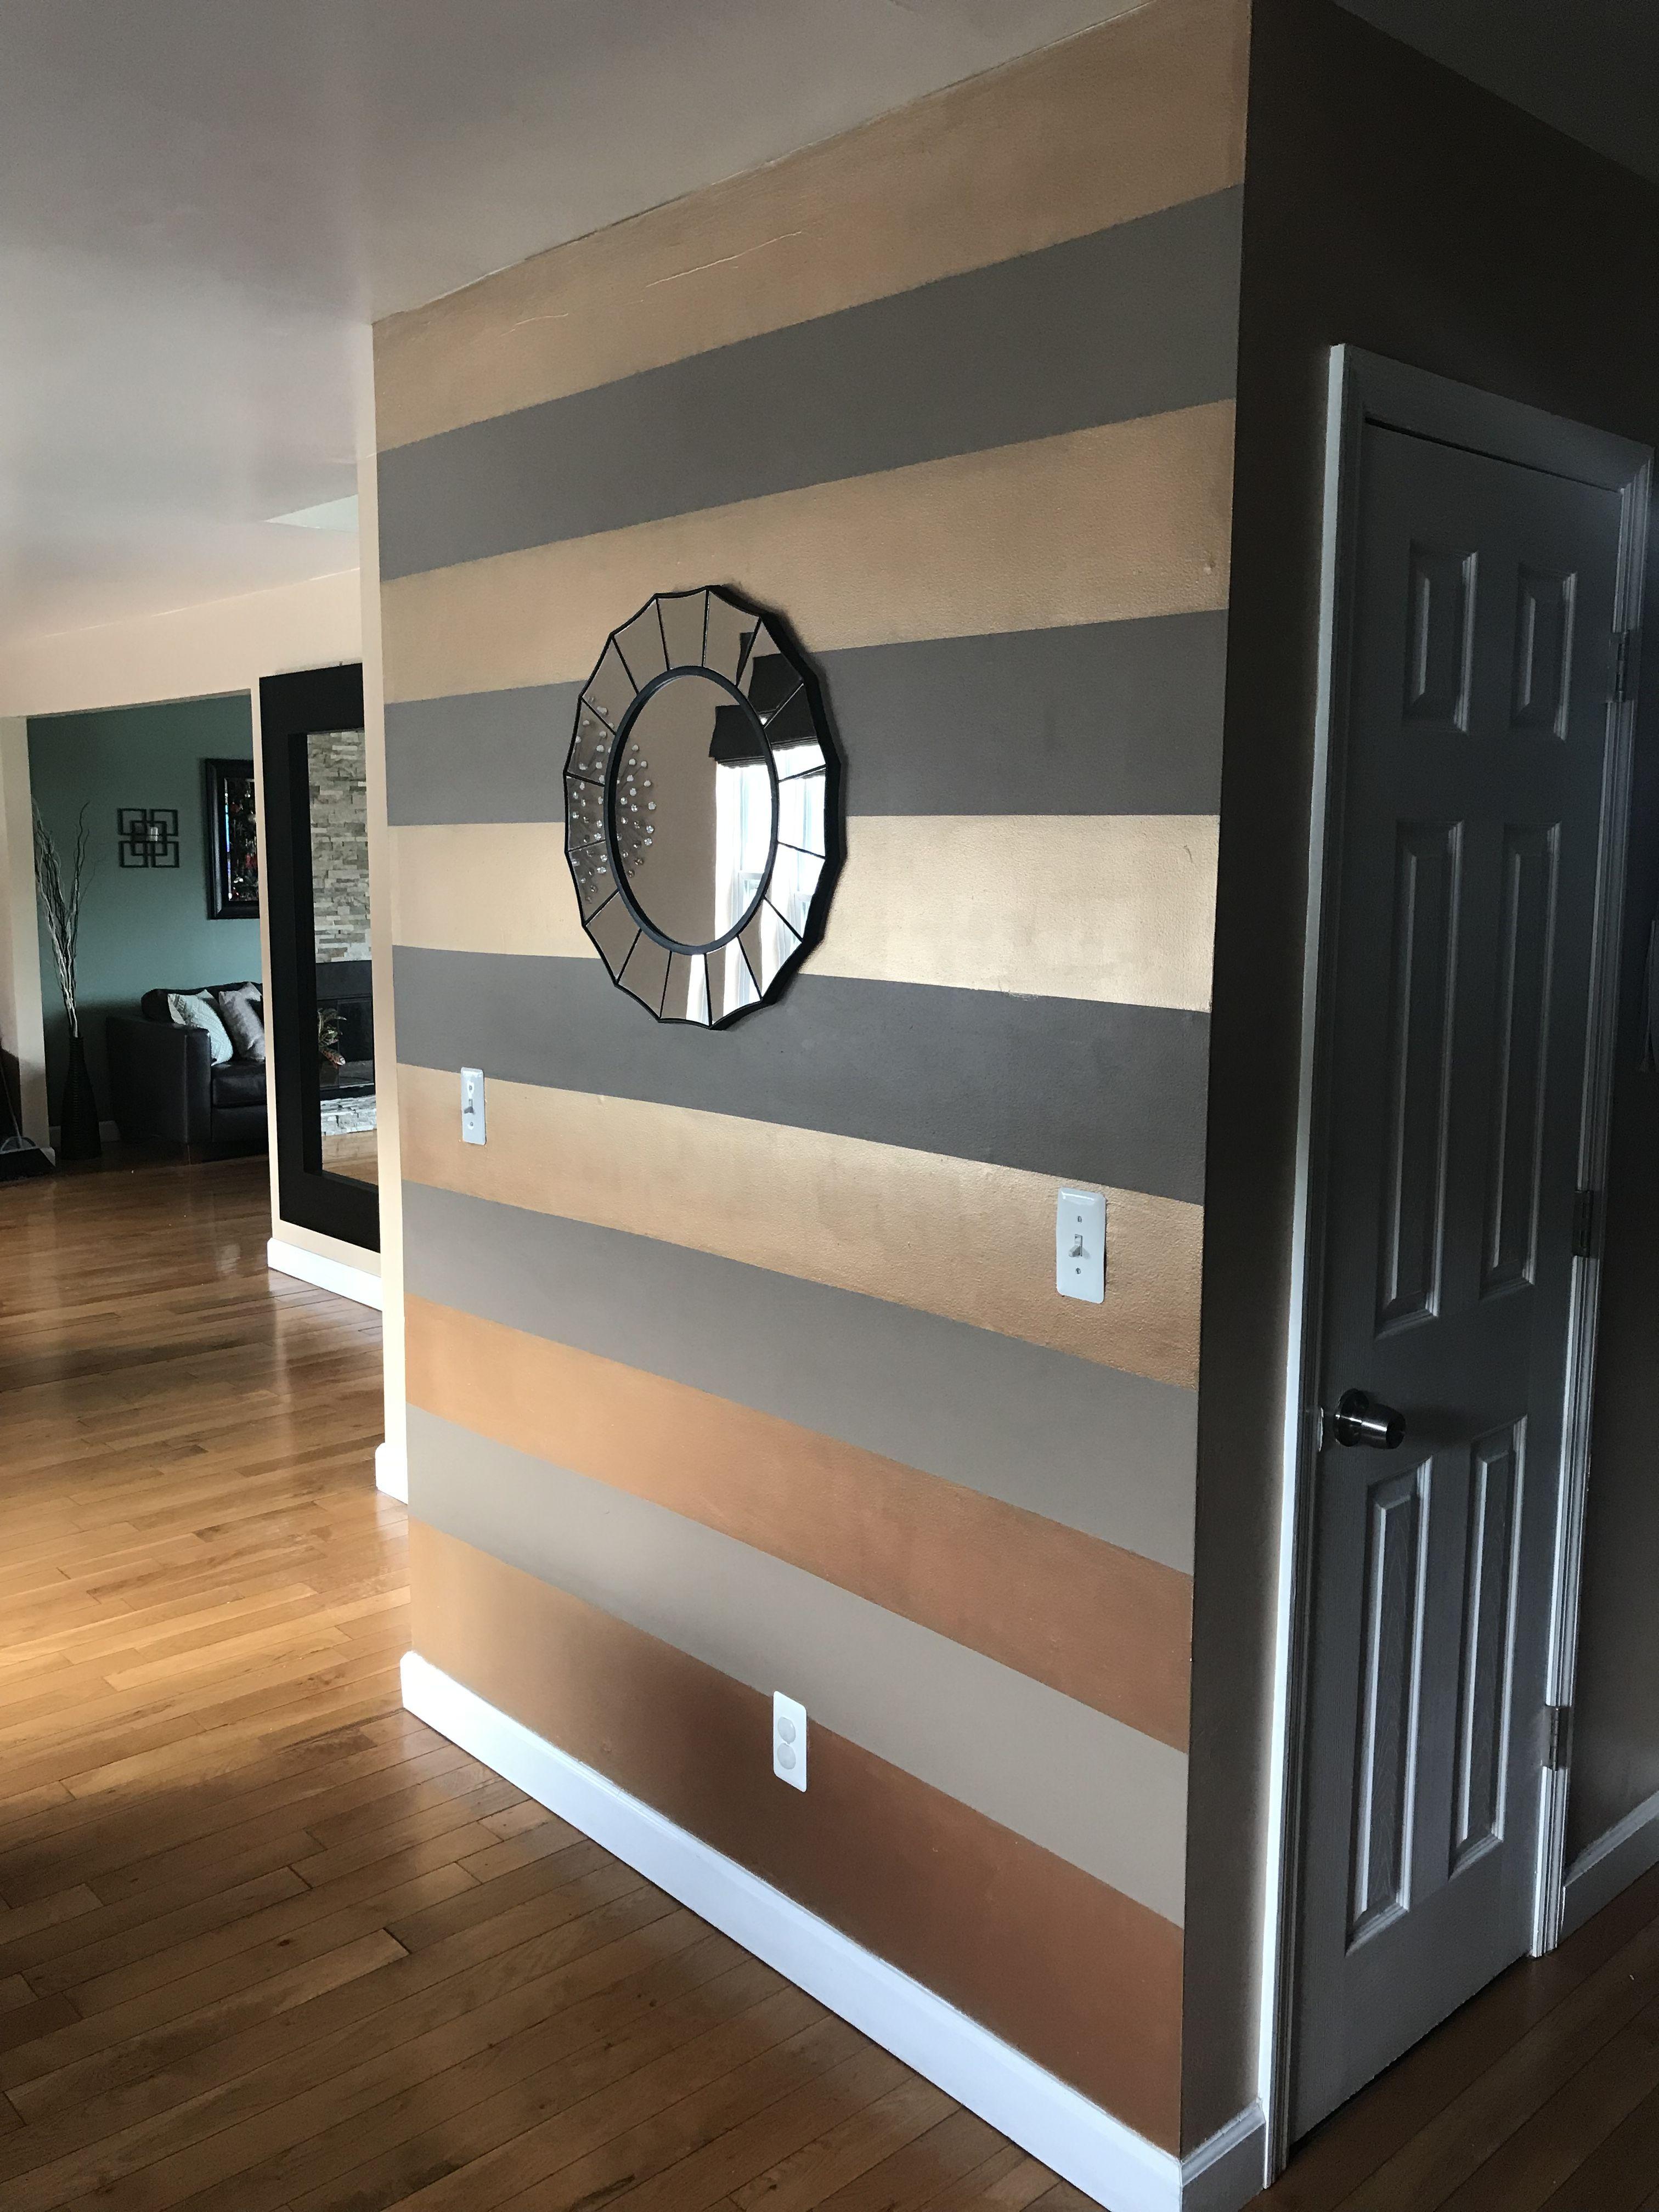 Metallic Copper Wall Stripes For Kitchen Accent Wall Accent Wall Paint Striped Accent Walls Accent Wall In Kitchen #paint #accent #wall #living #room